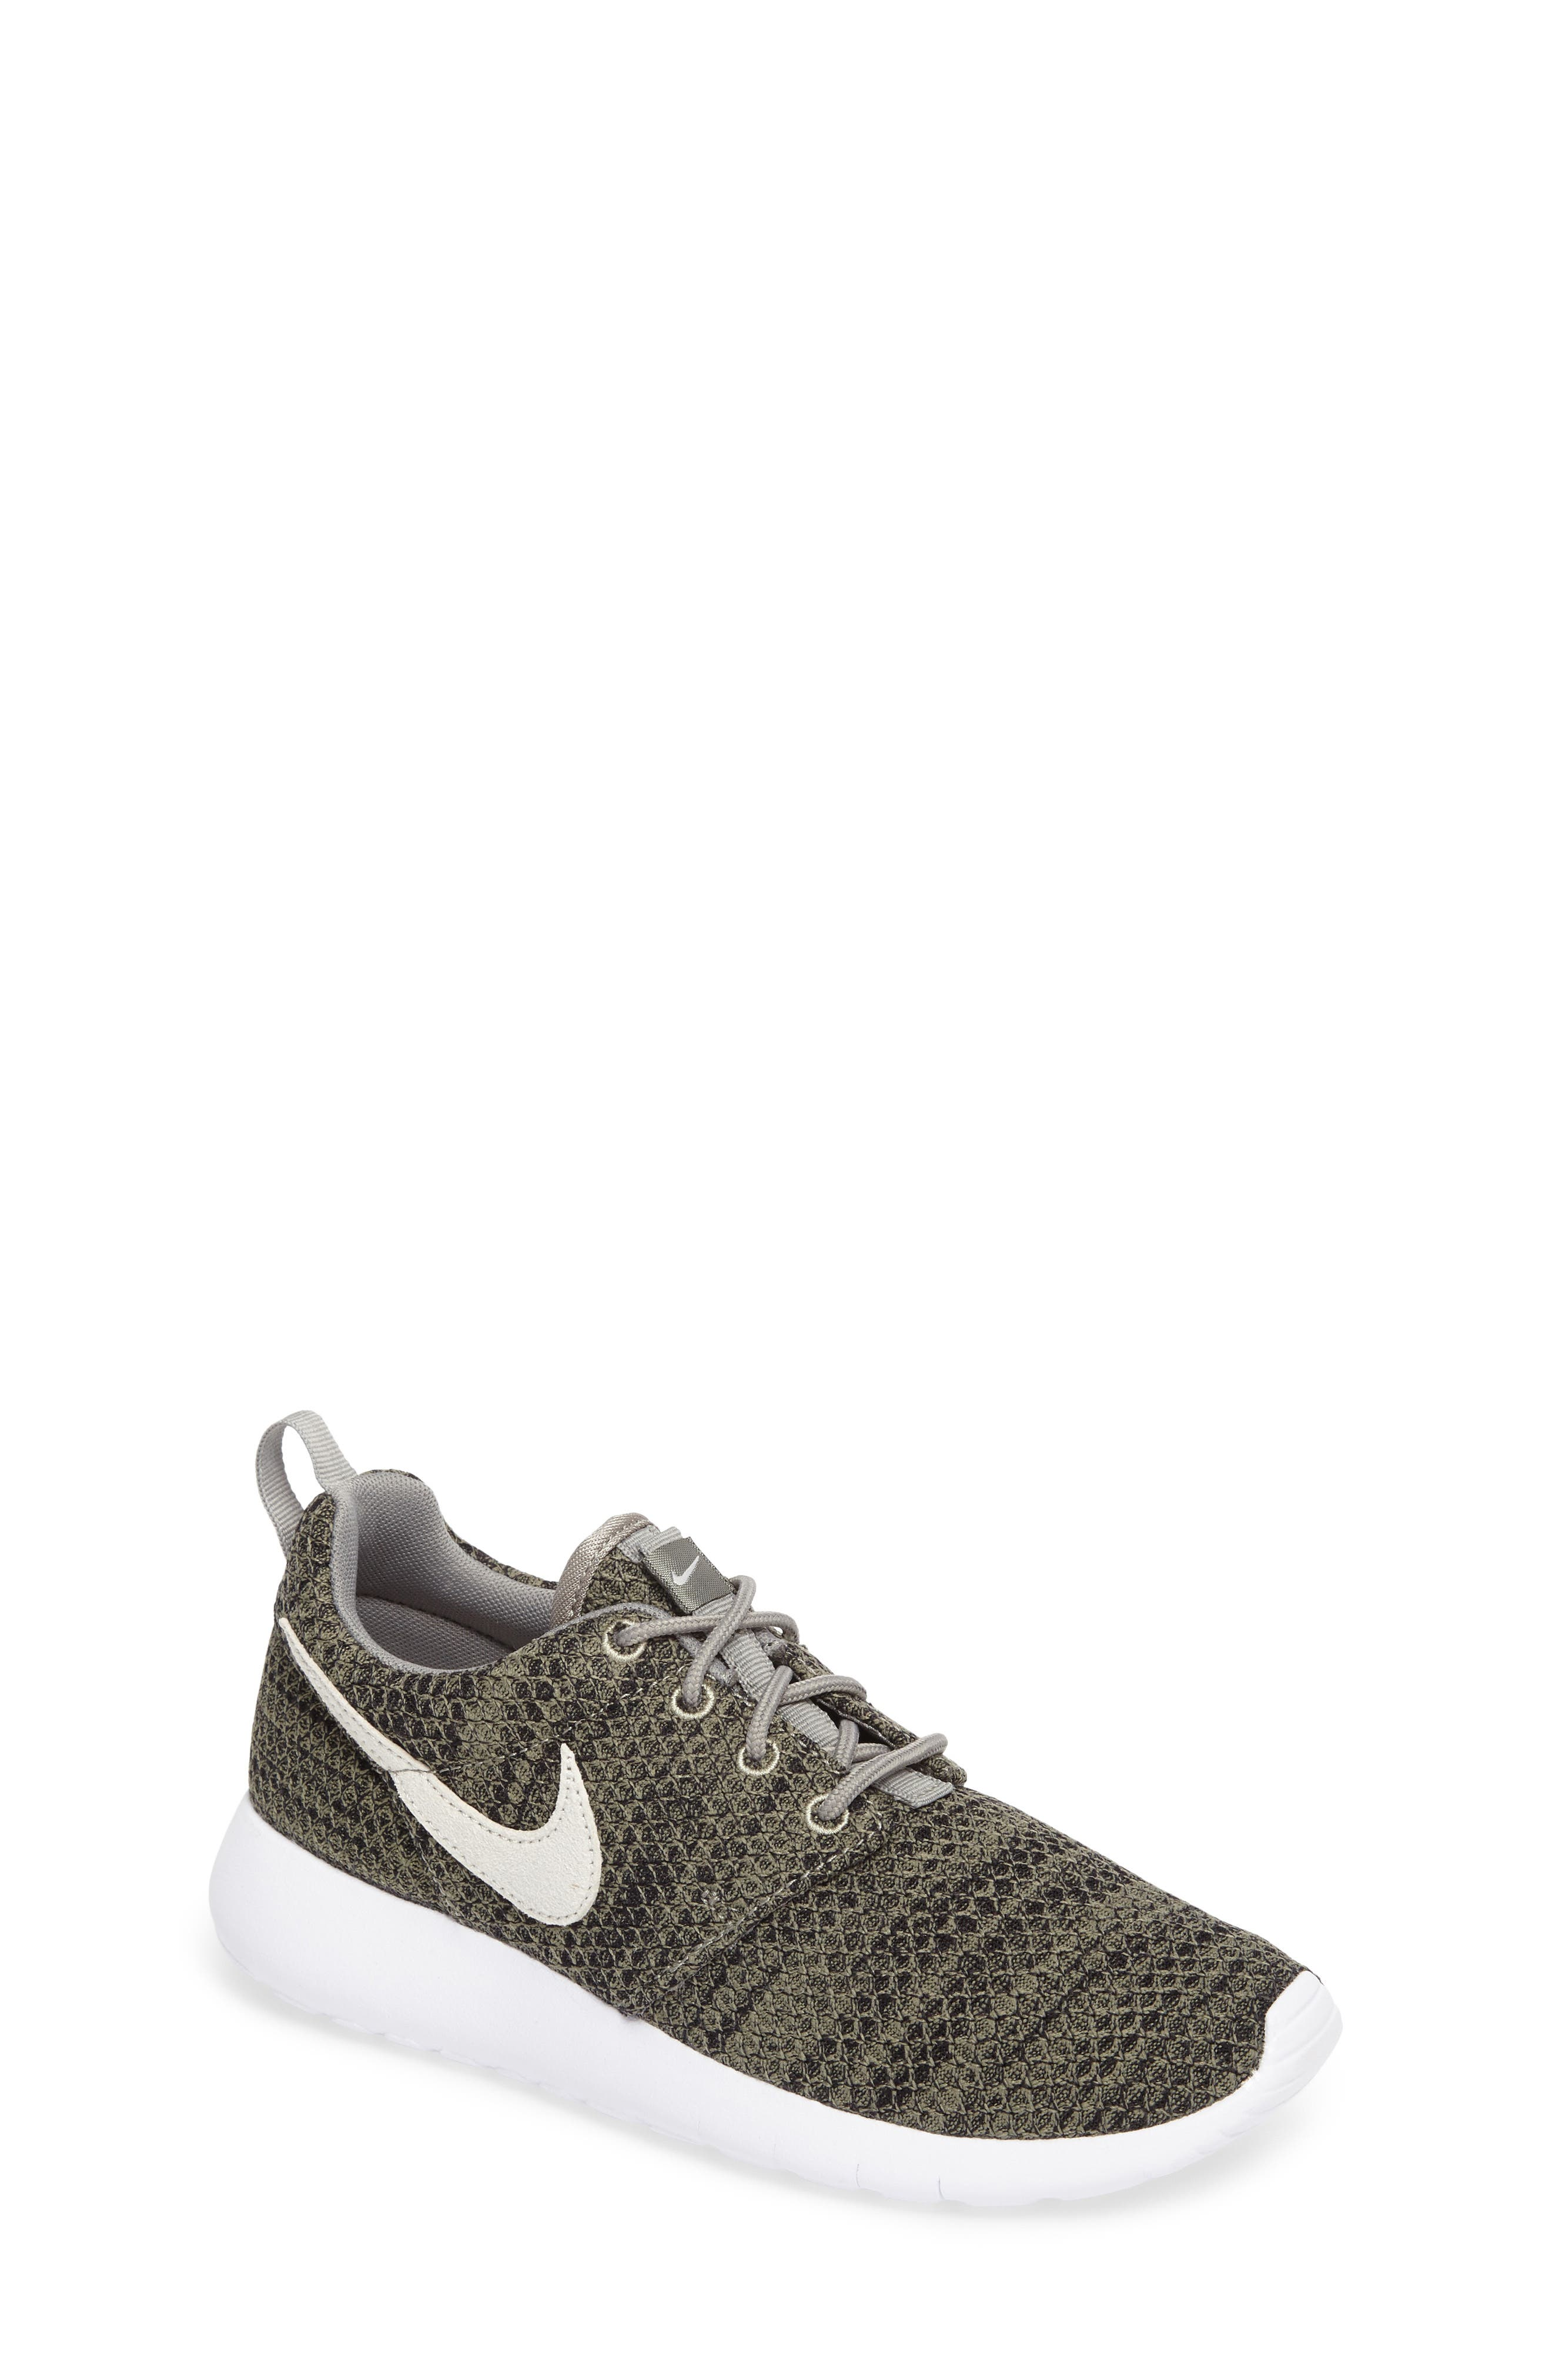 Alternate Image 1 Selected - Nike 'Roshe Run' Sneaker (Little Kid & Big Kid)